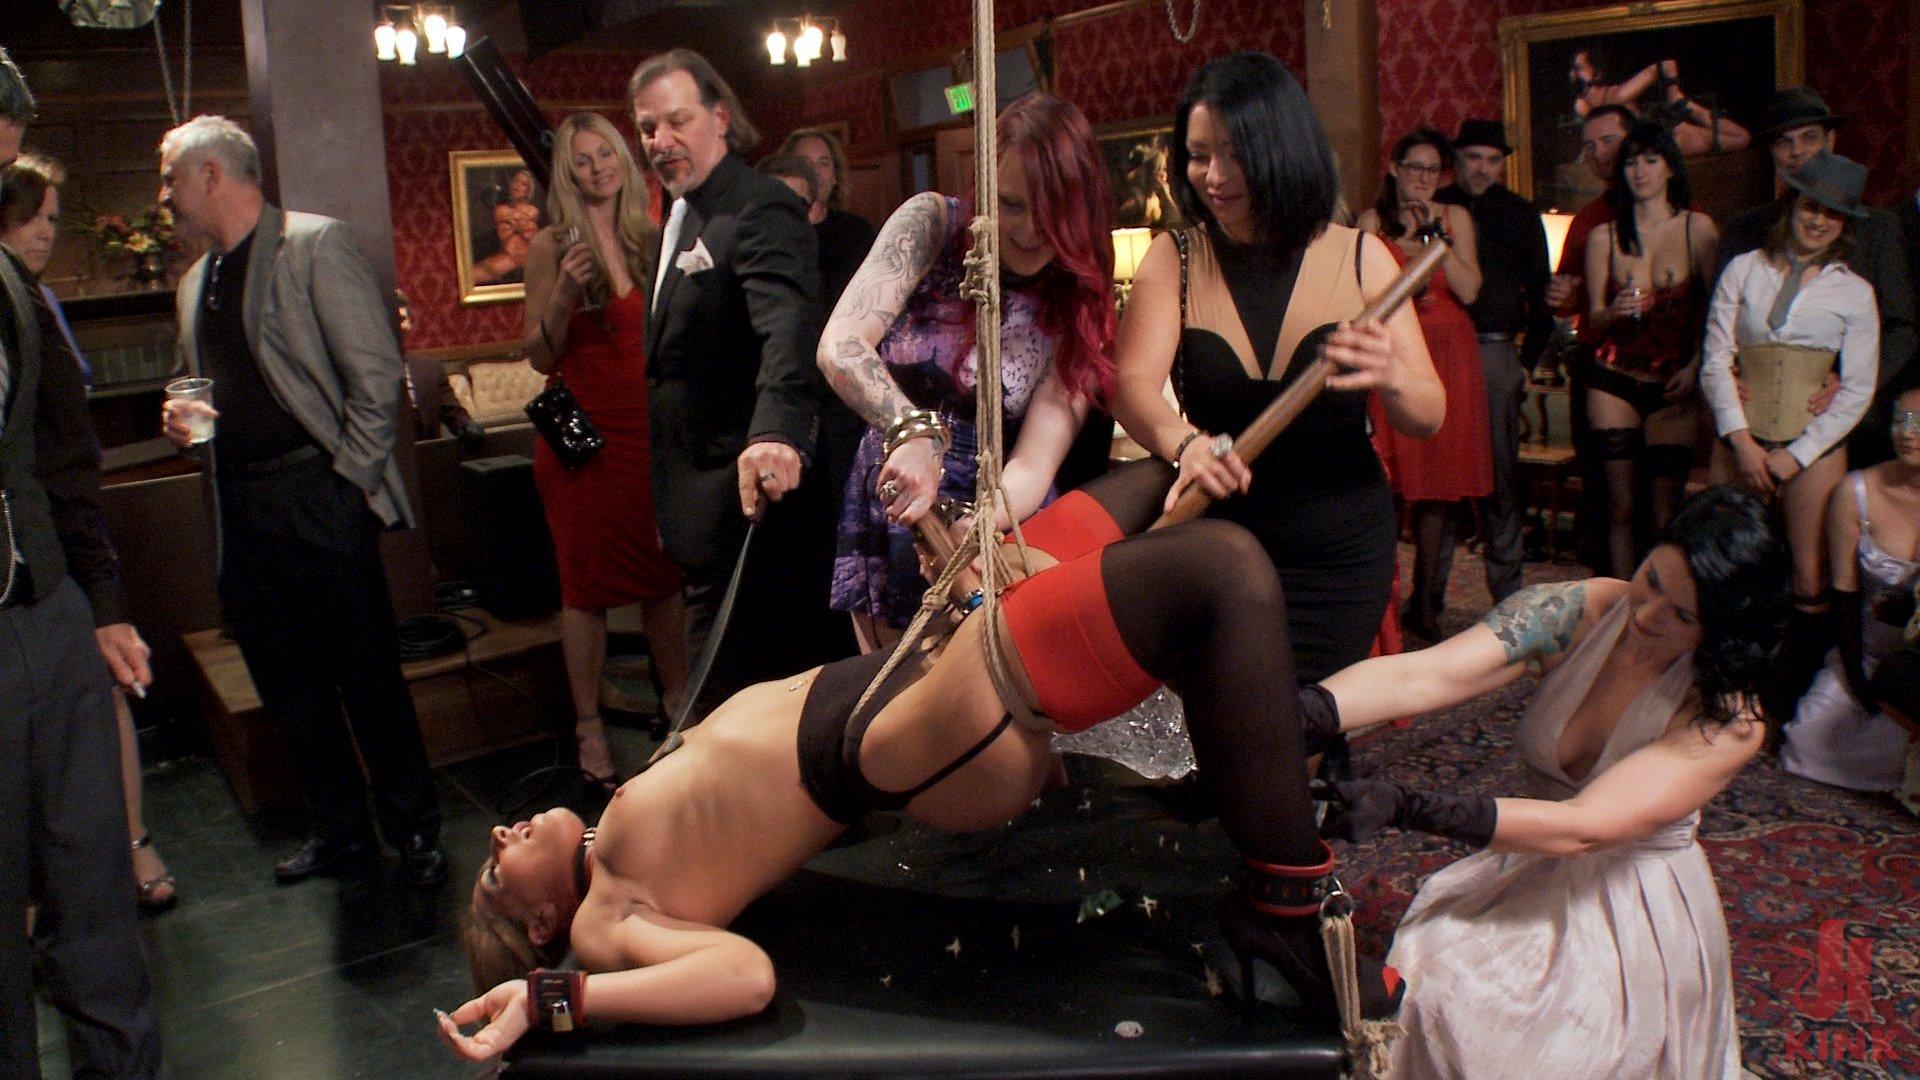 Sample photos free erotic dancer agree